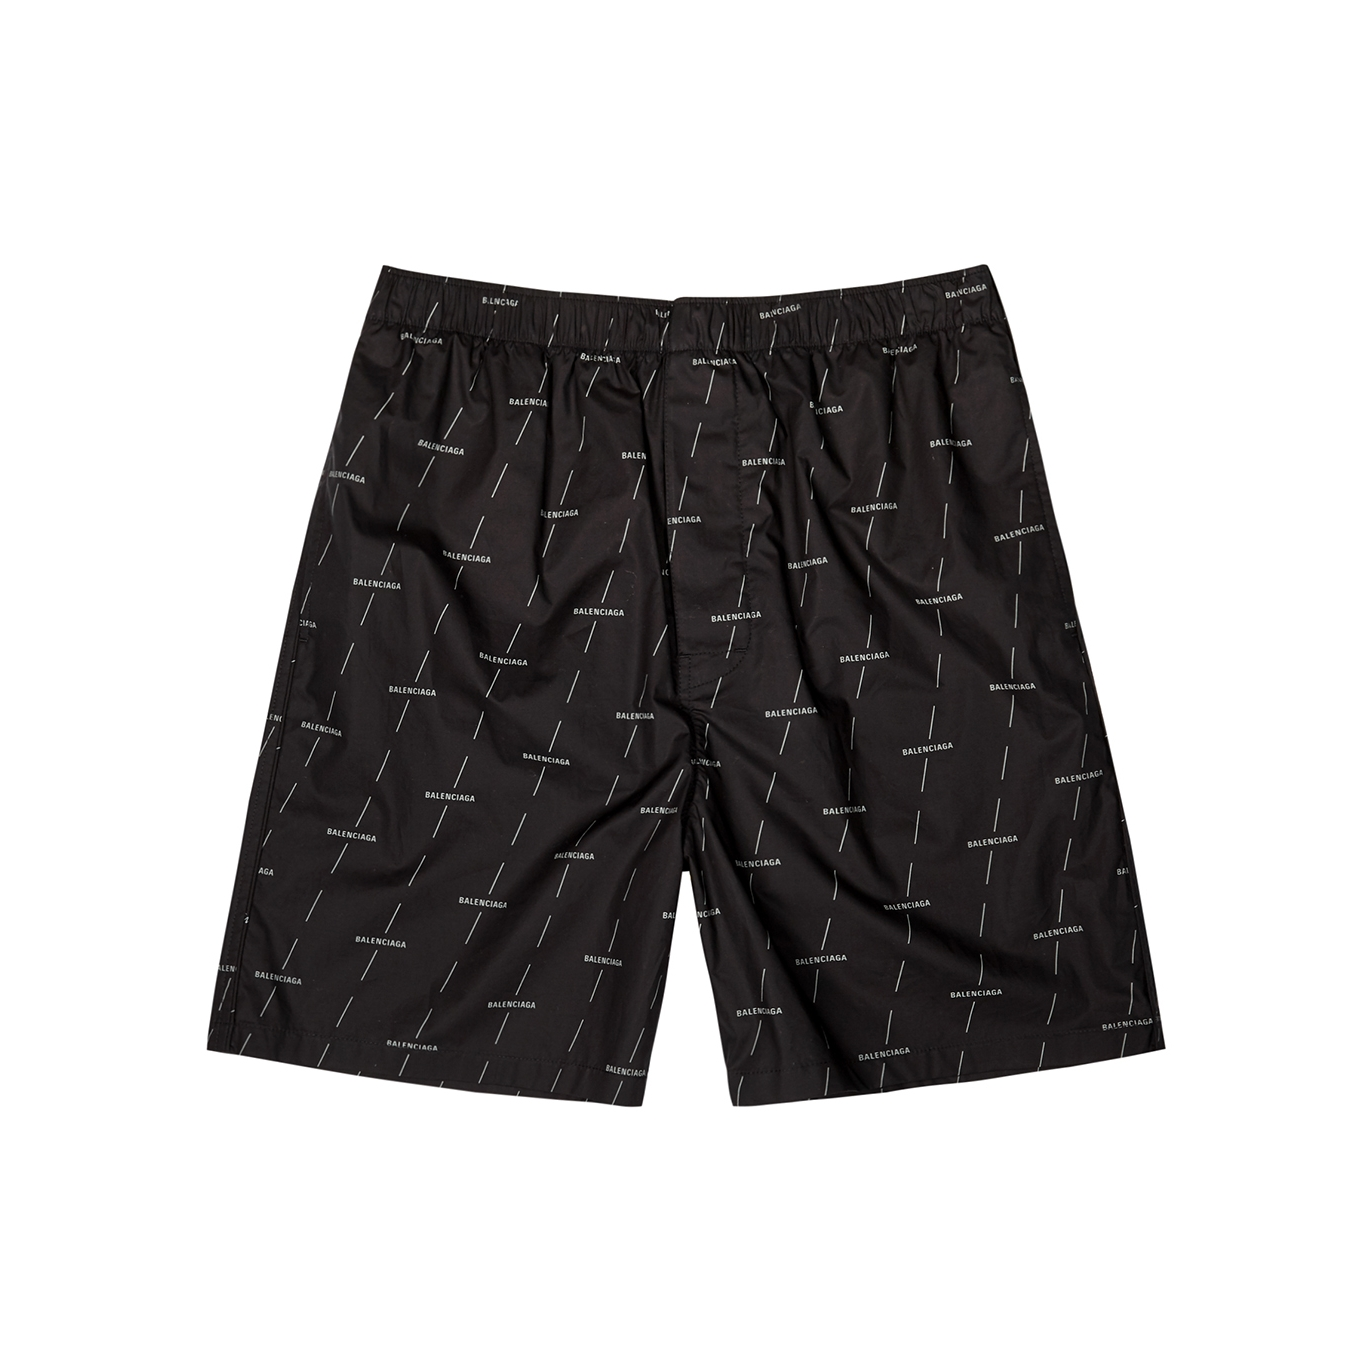 Balenciaga Black Logo Print Cotton Poplin Shorts Harvey Nichols